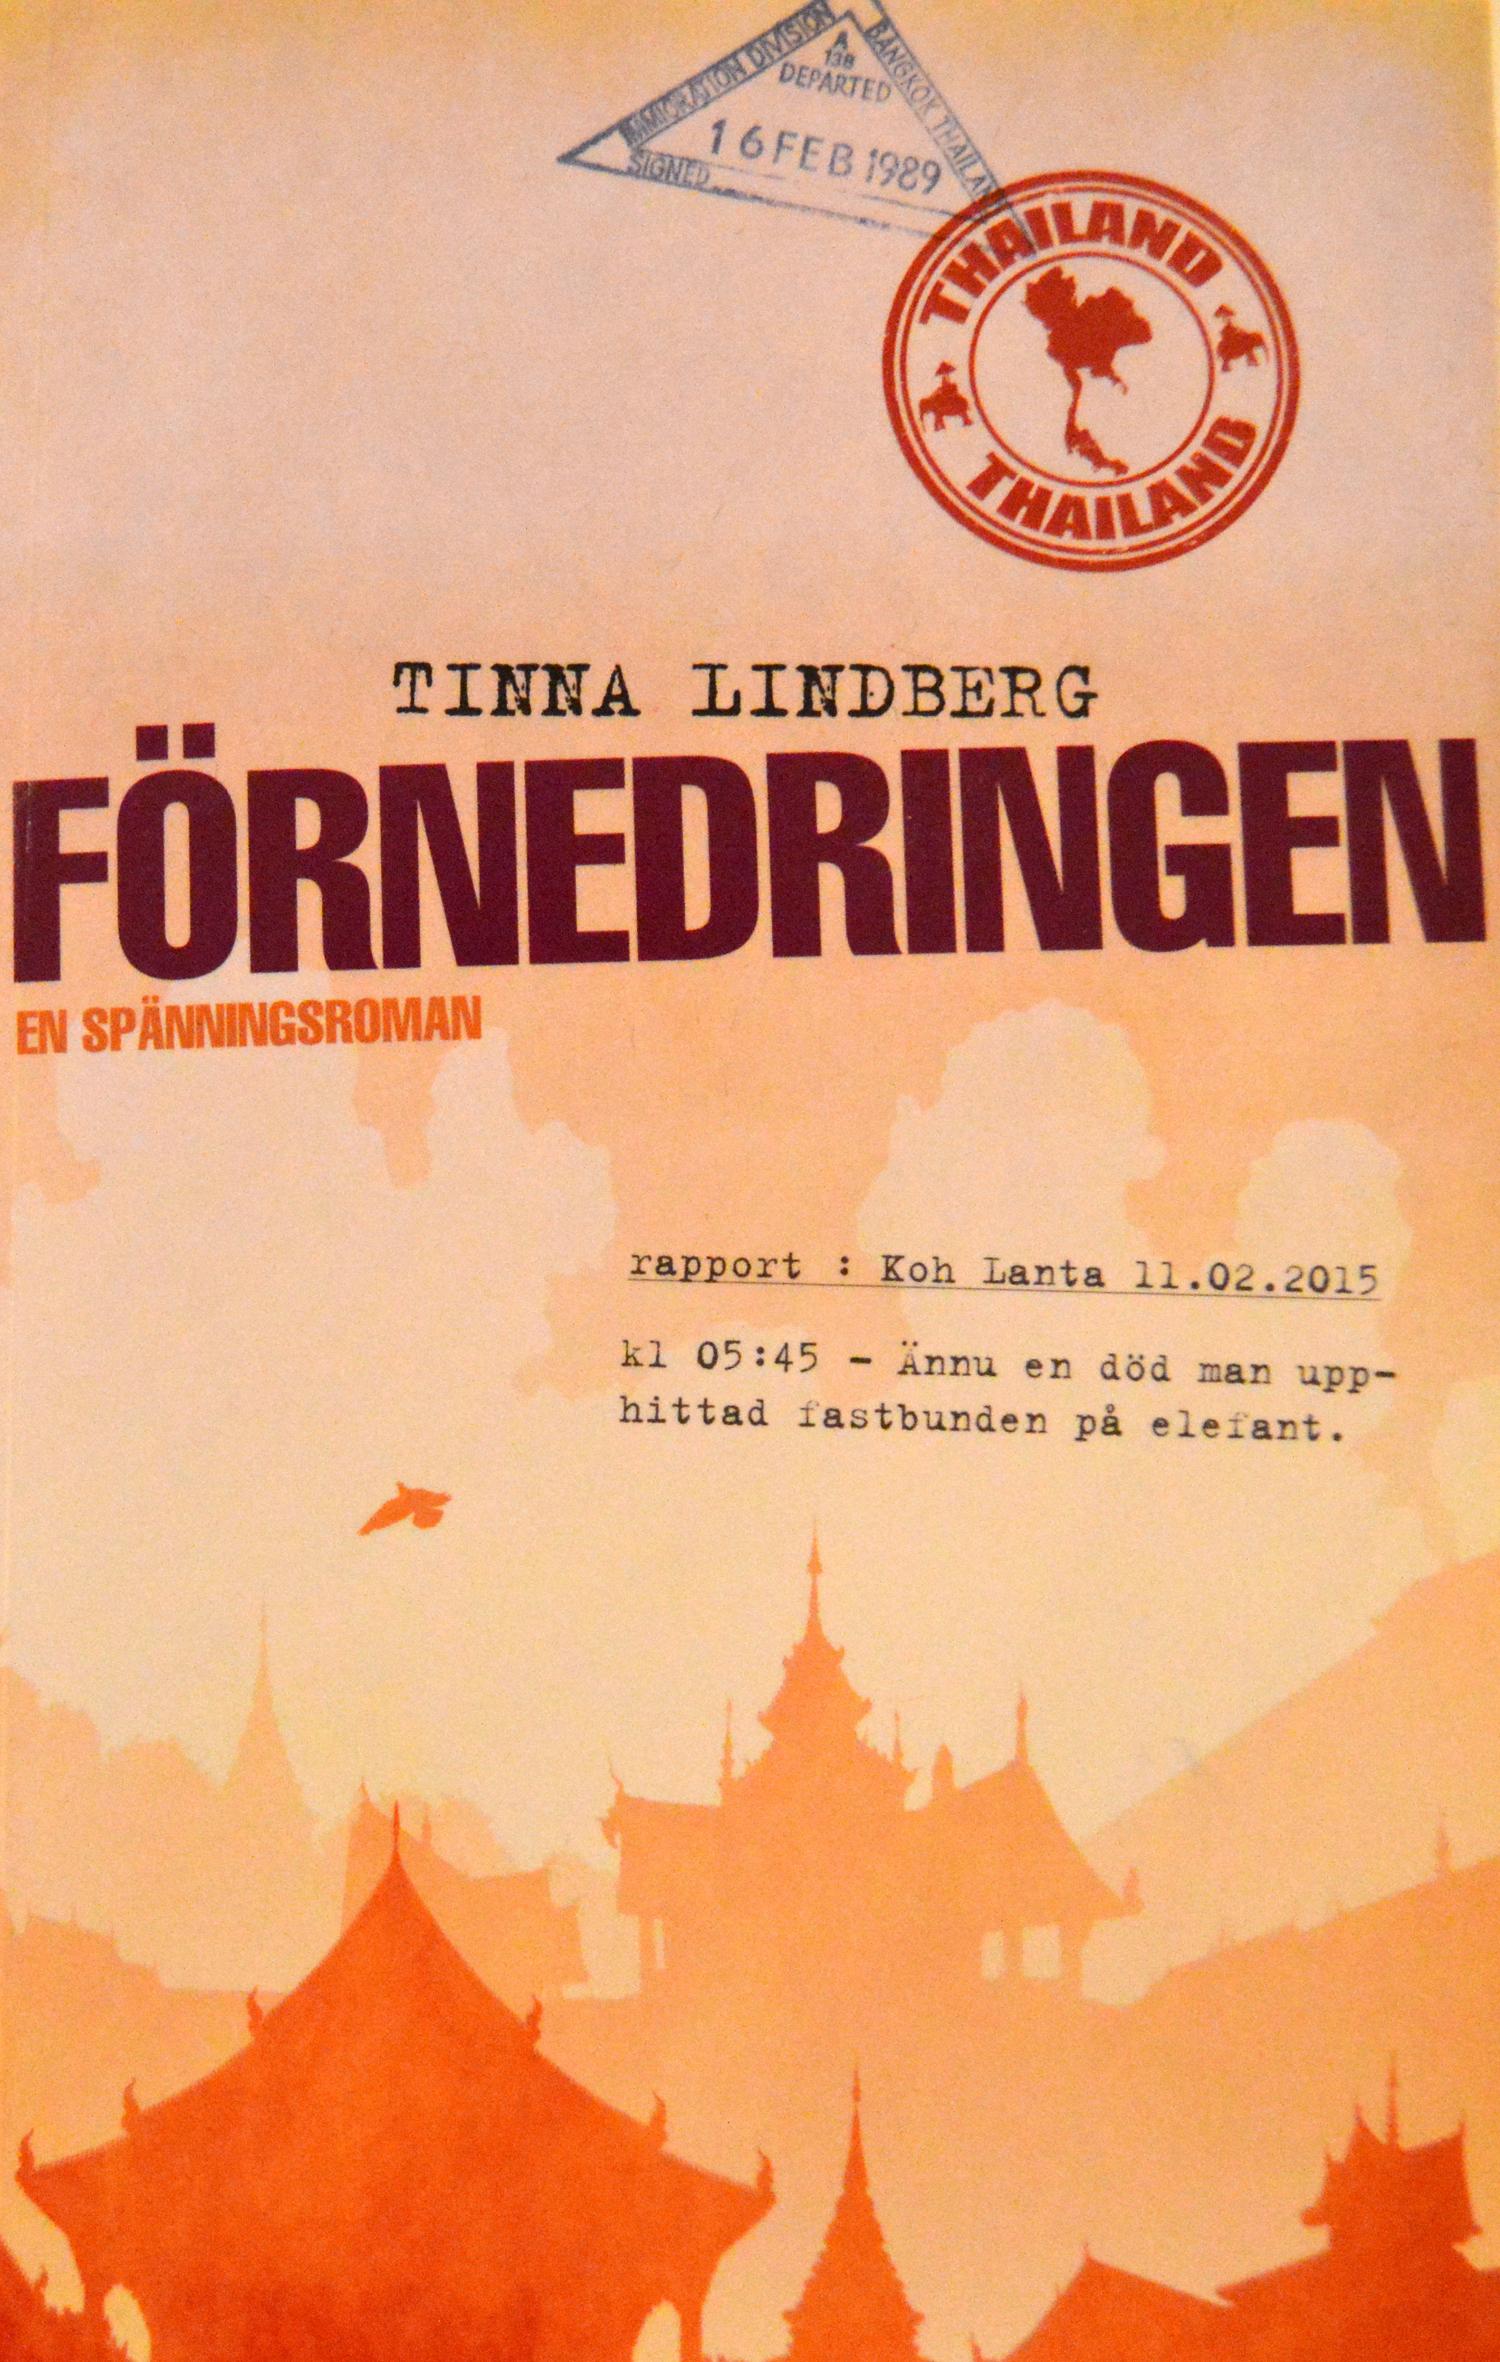 TinnaLindberg